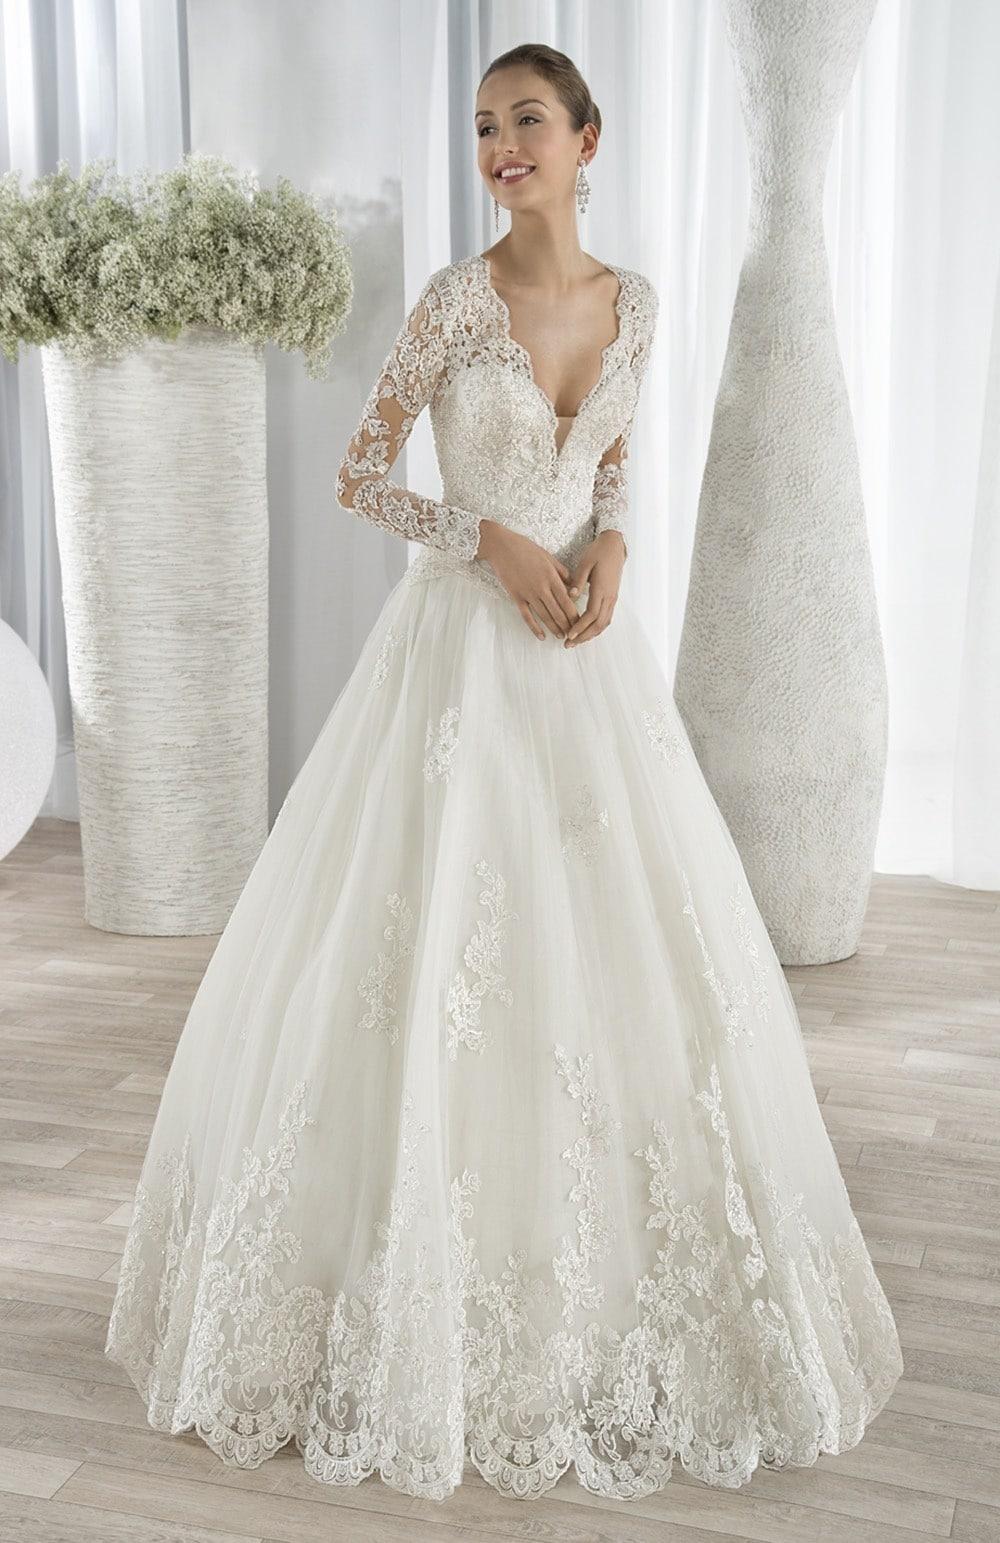 Robe de mariée Modèle Elvine – 646